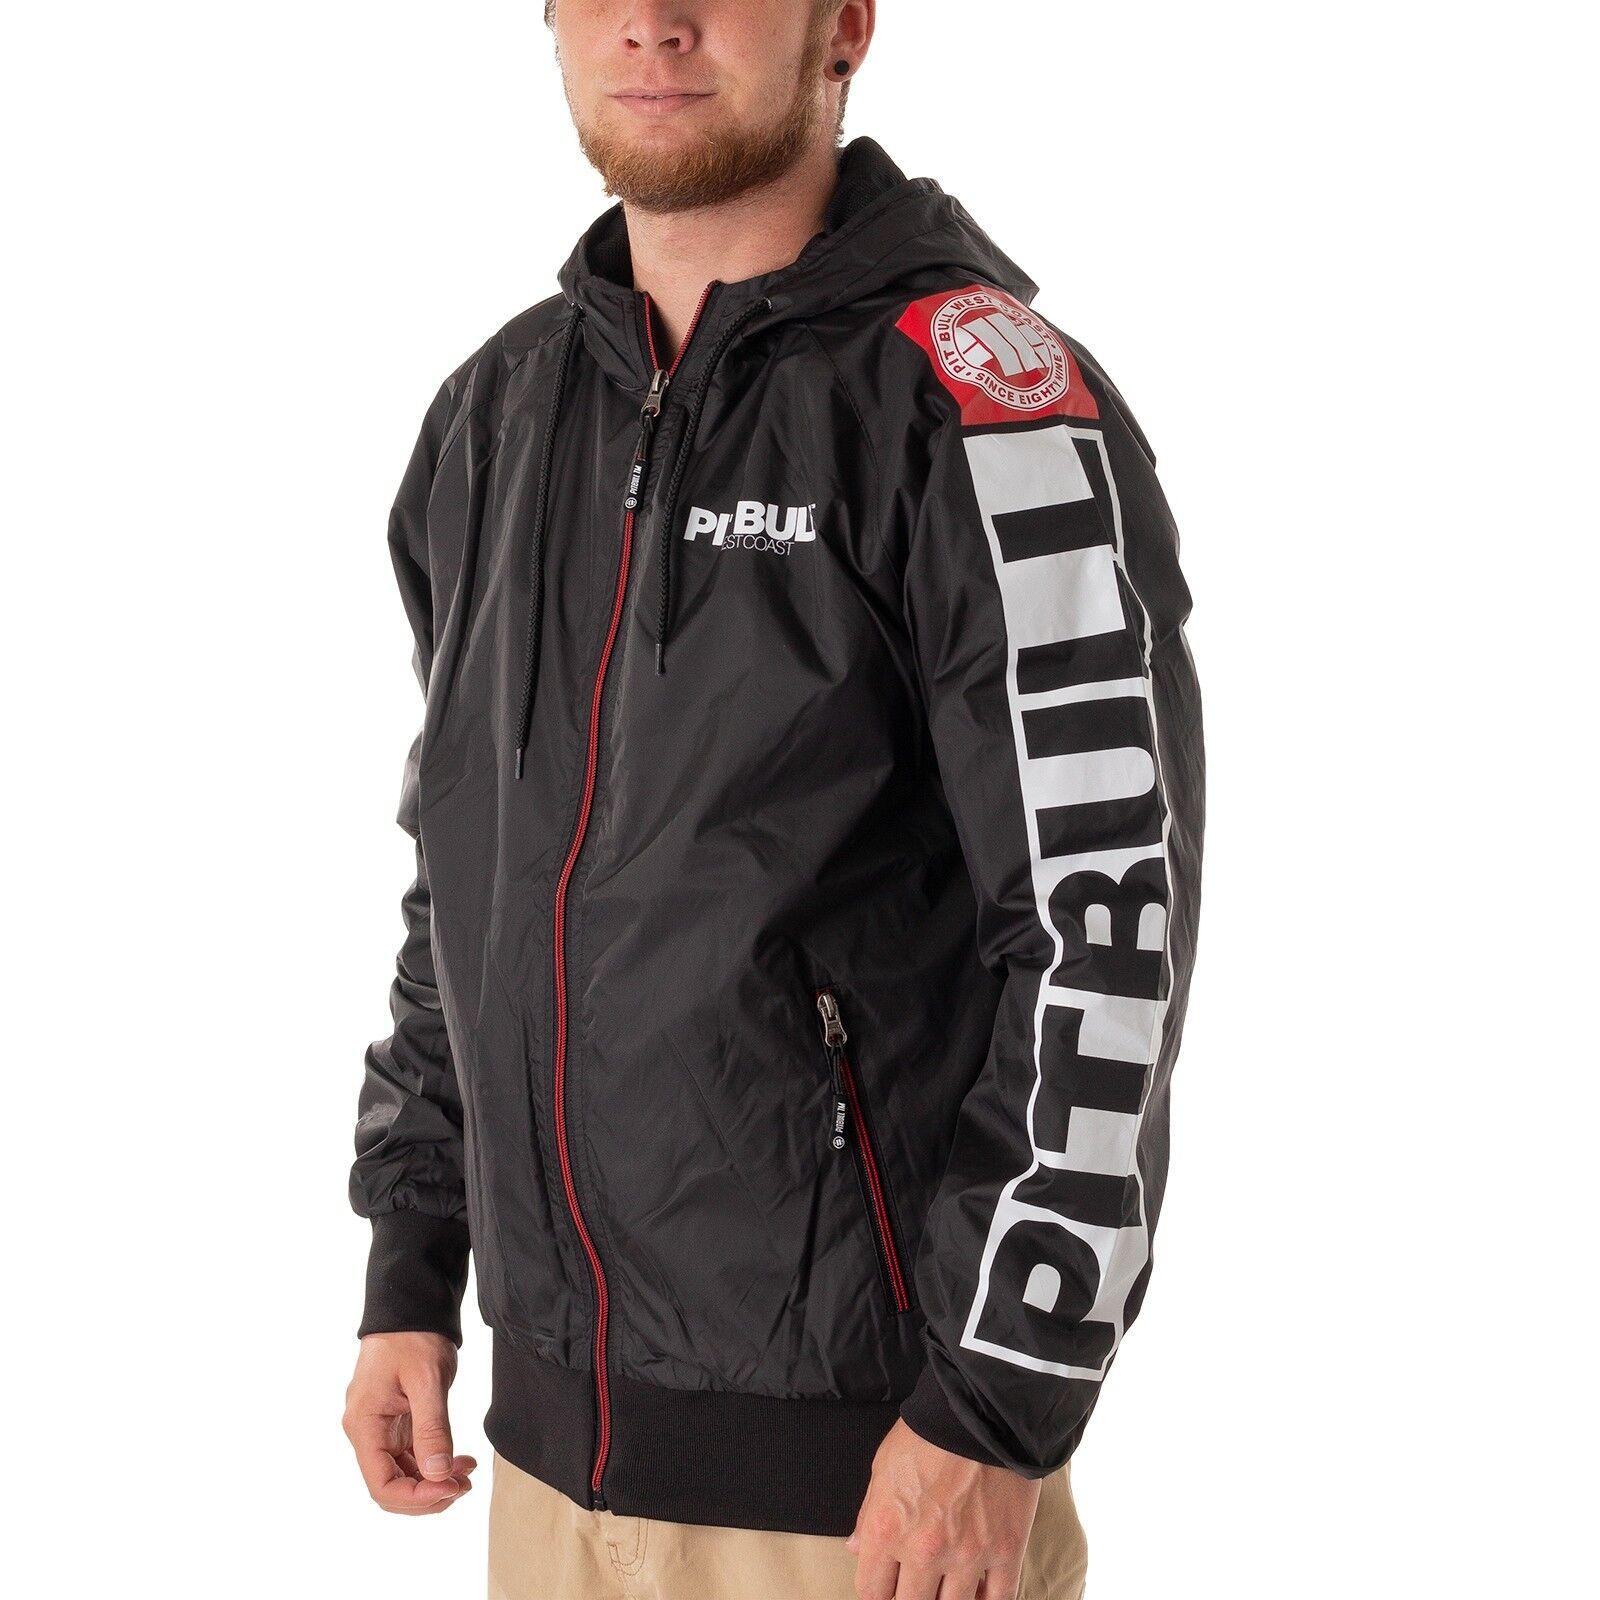 P.B.M.C Pitt Bull Athletic 8 Jacke Herren Übergangsjacke schwarz 43251